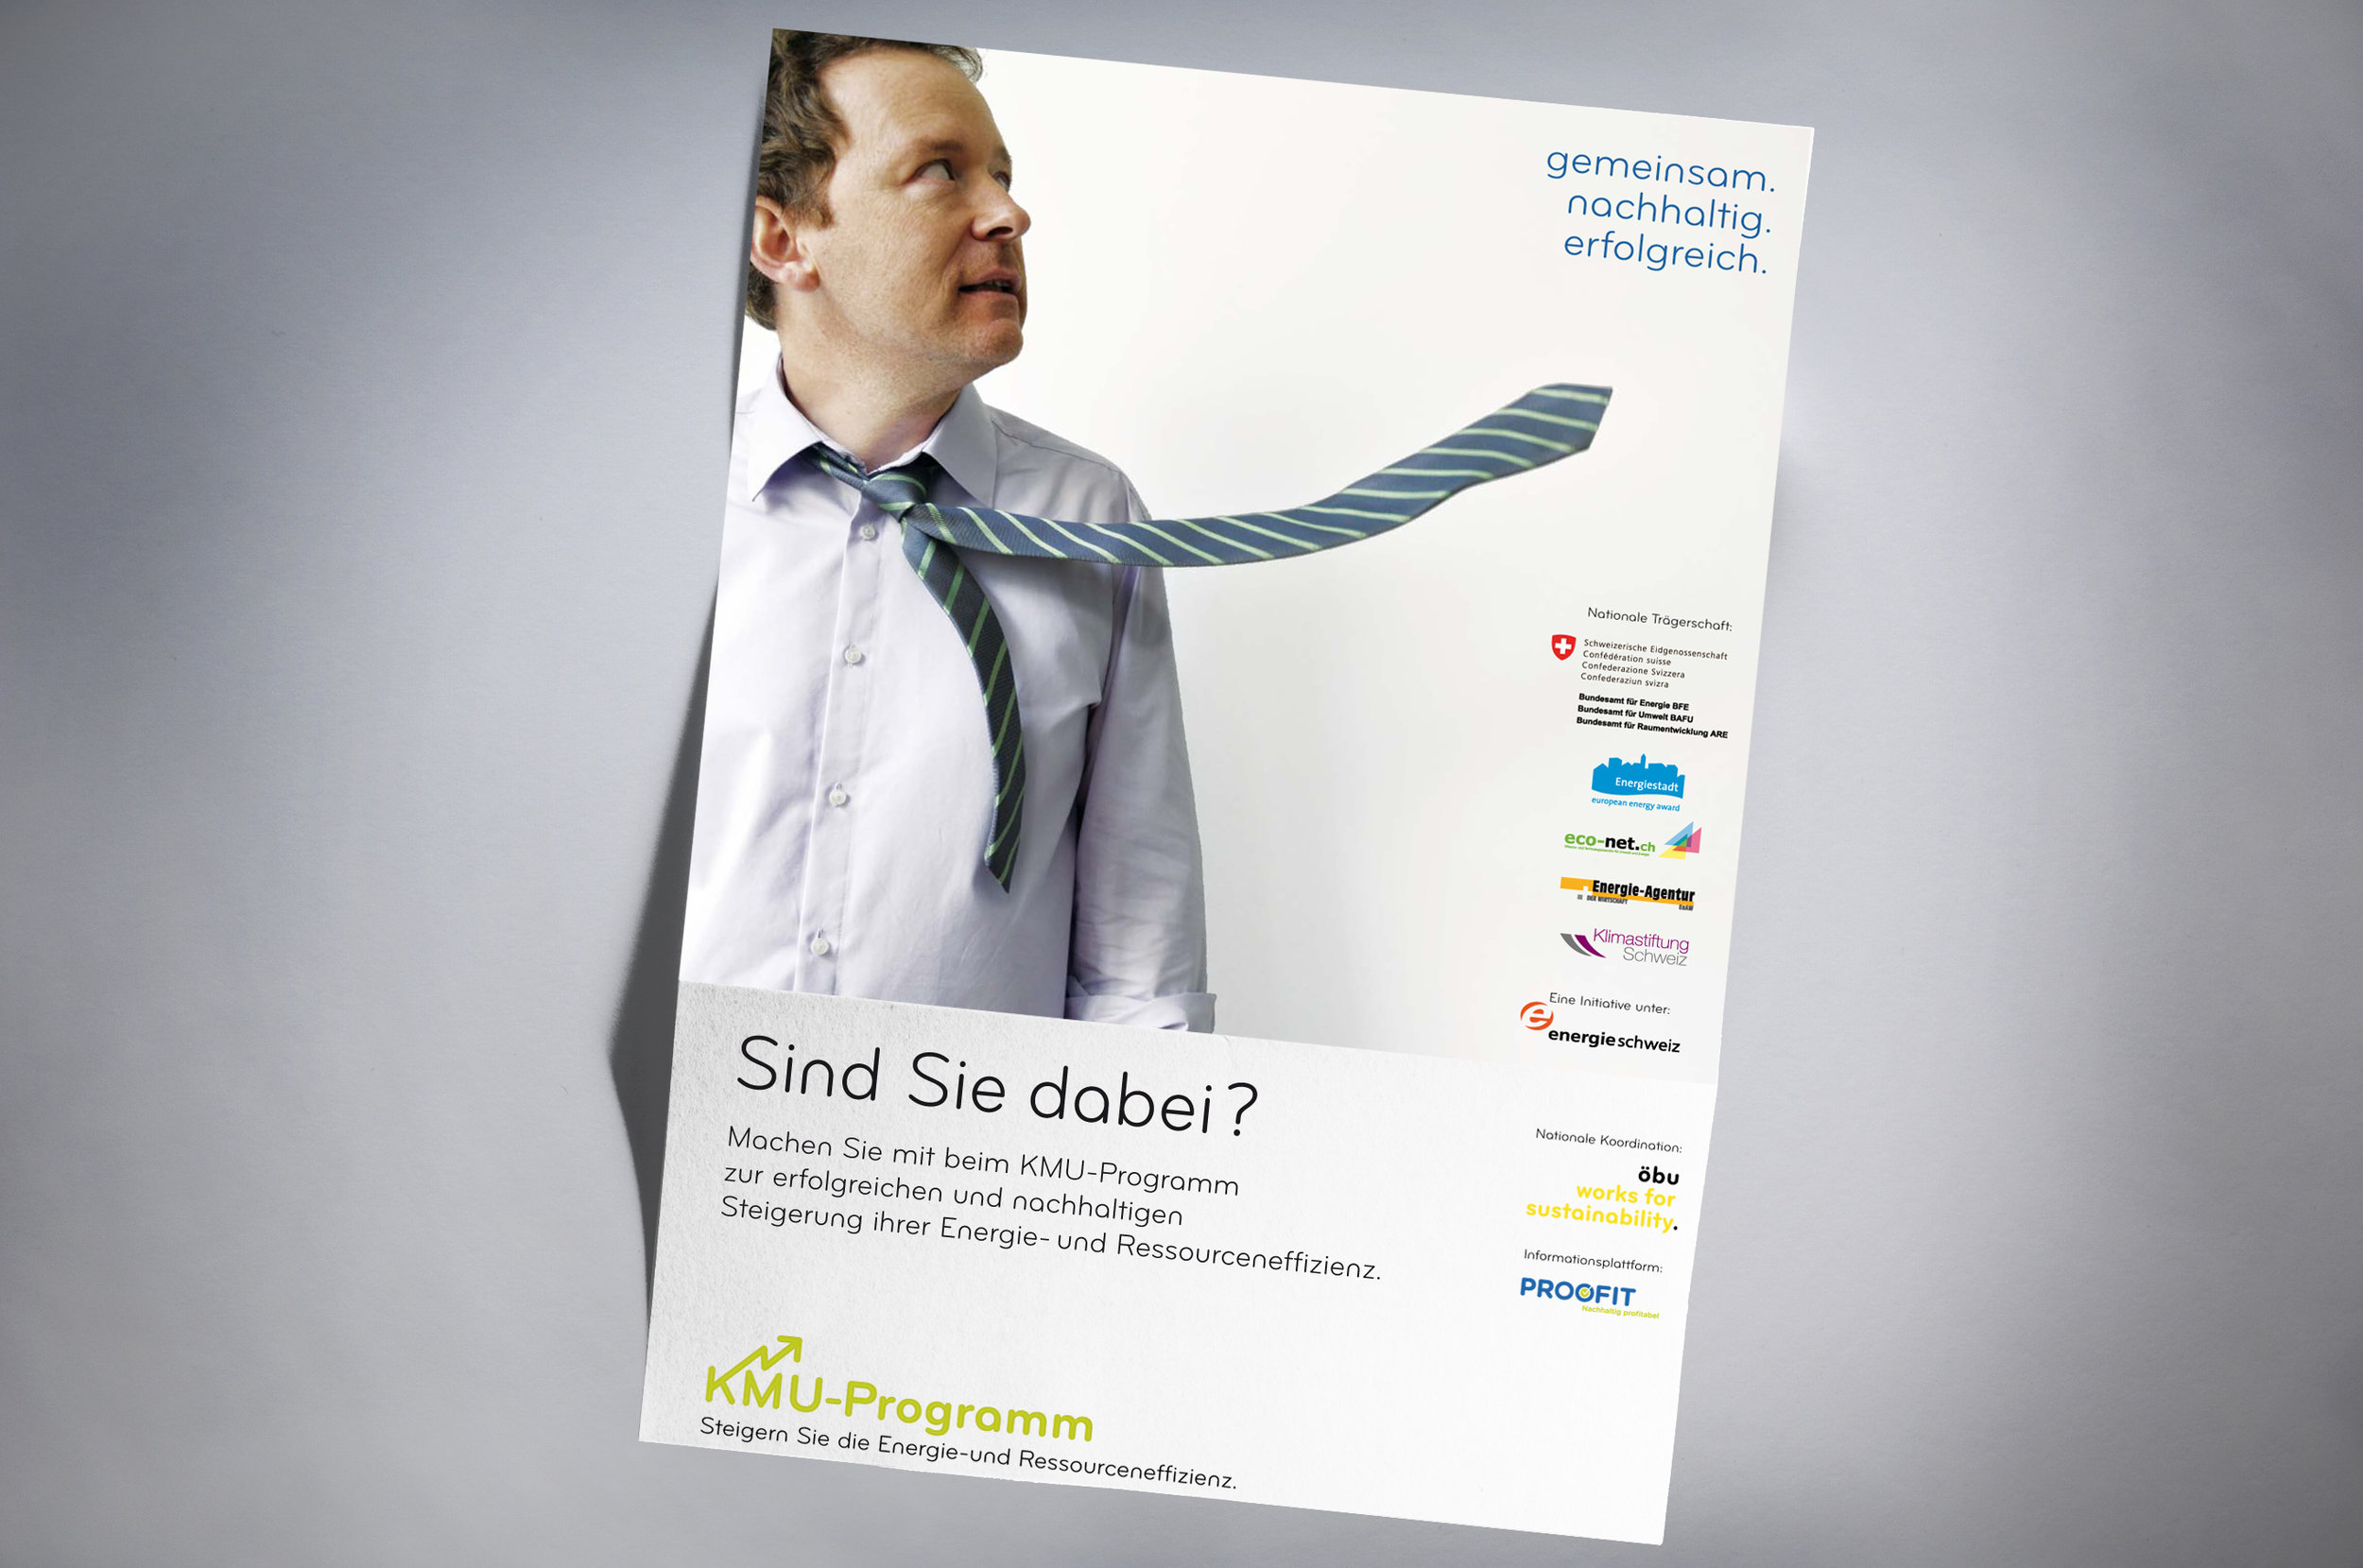 OebuKMU-Programm - Projektkoordination: Sabine Ziegler, OebuLogo Design, Gestaltung mehrsprachige Flyers:Christian Jaberg, jaberg.design